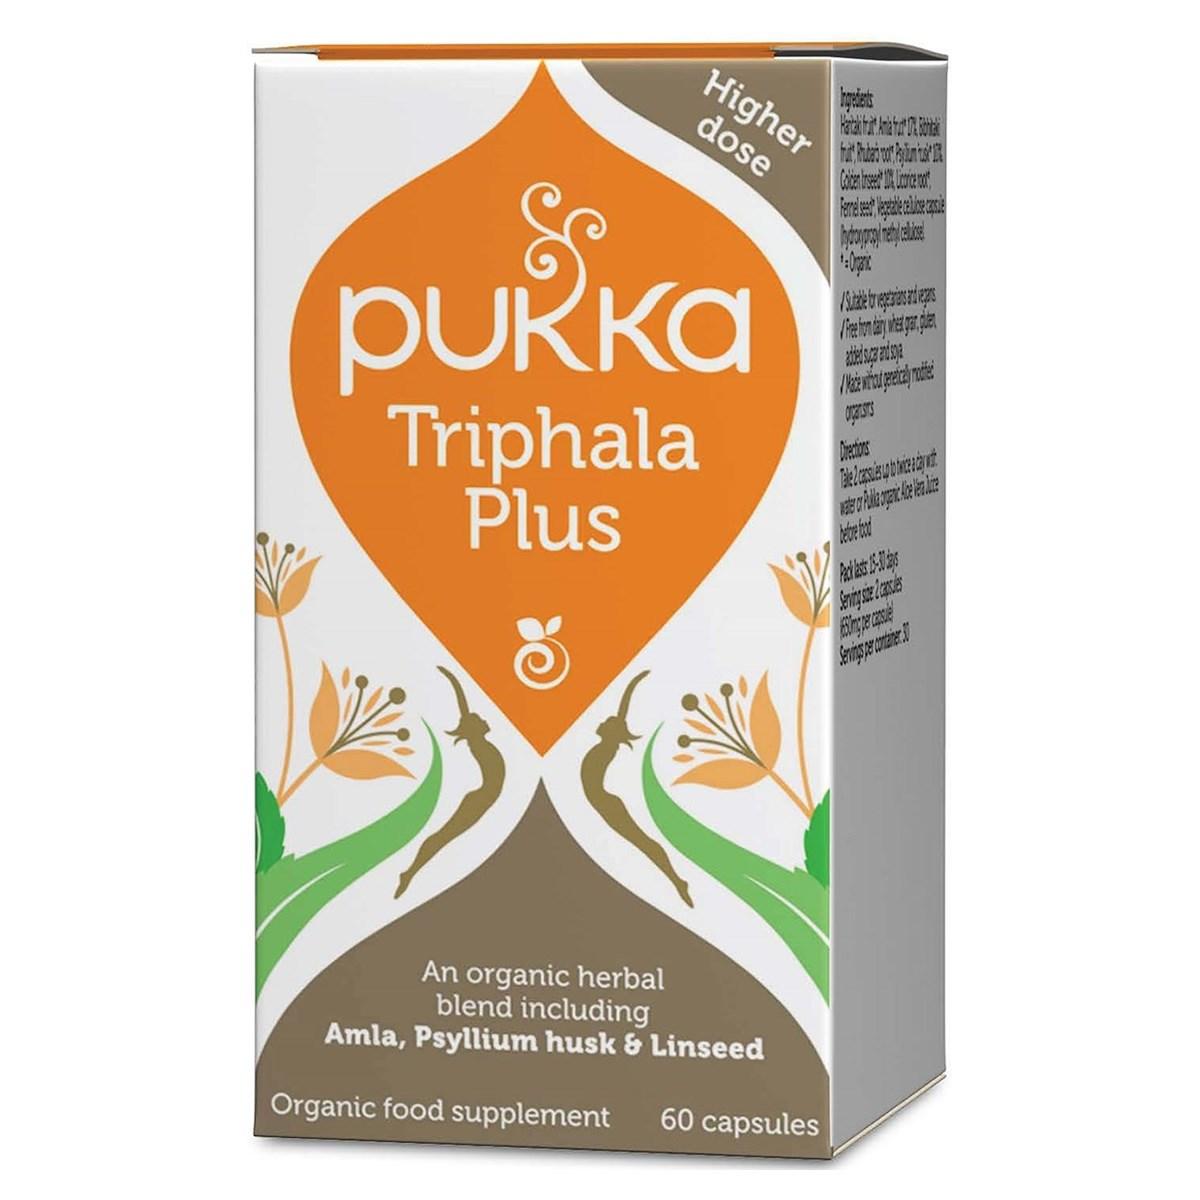 Pukka Triphala Plus Capsules